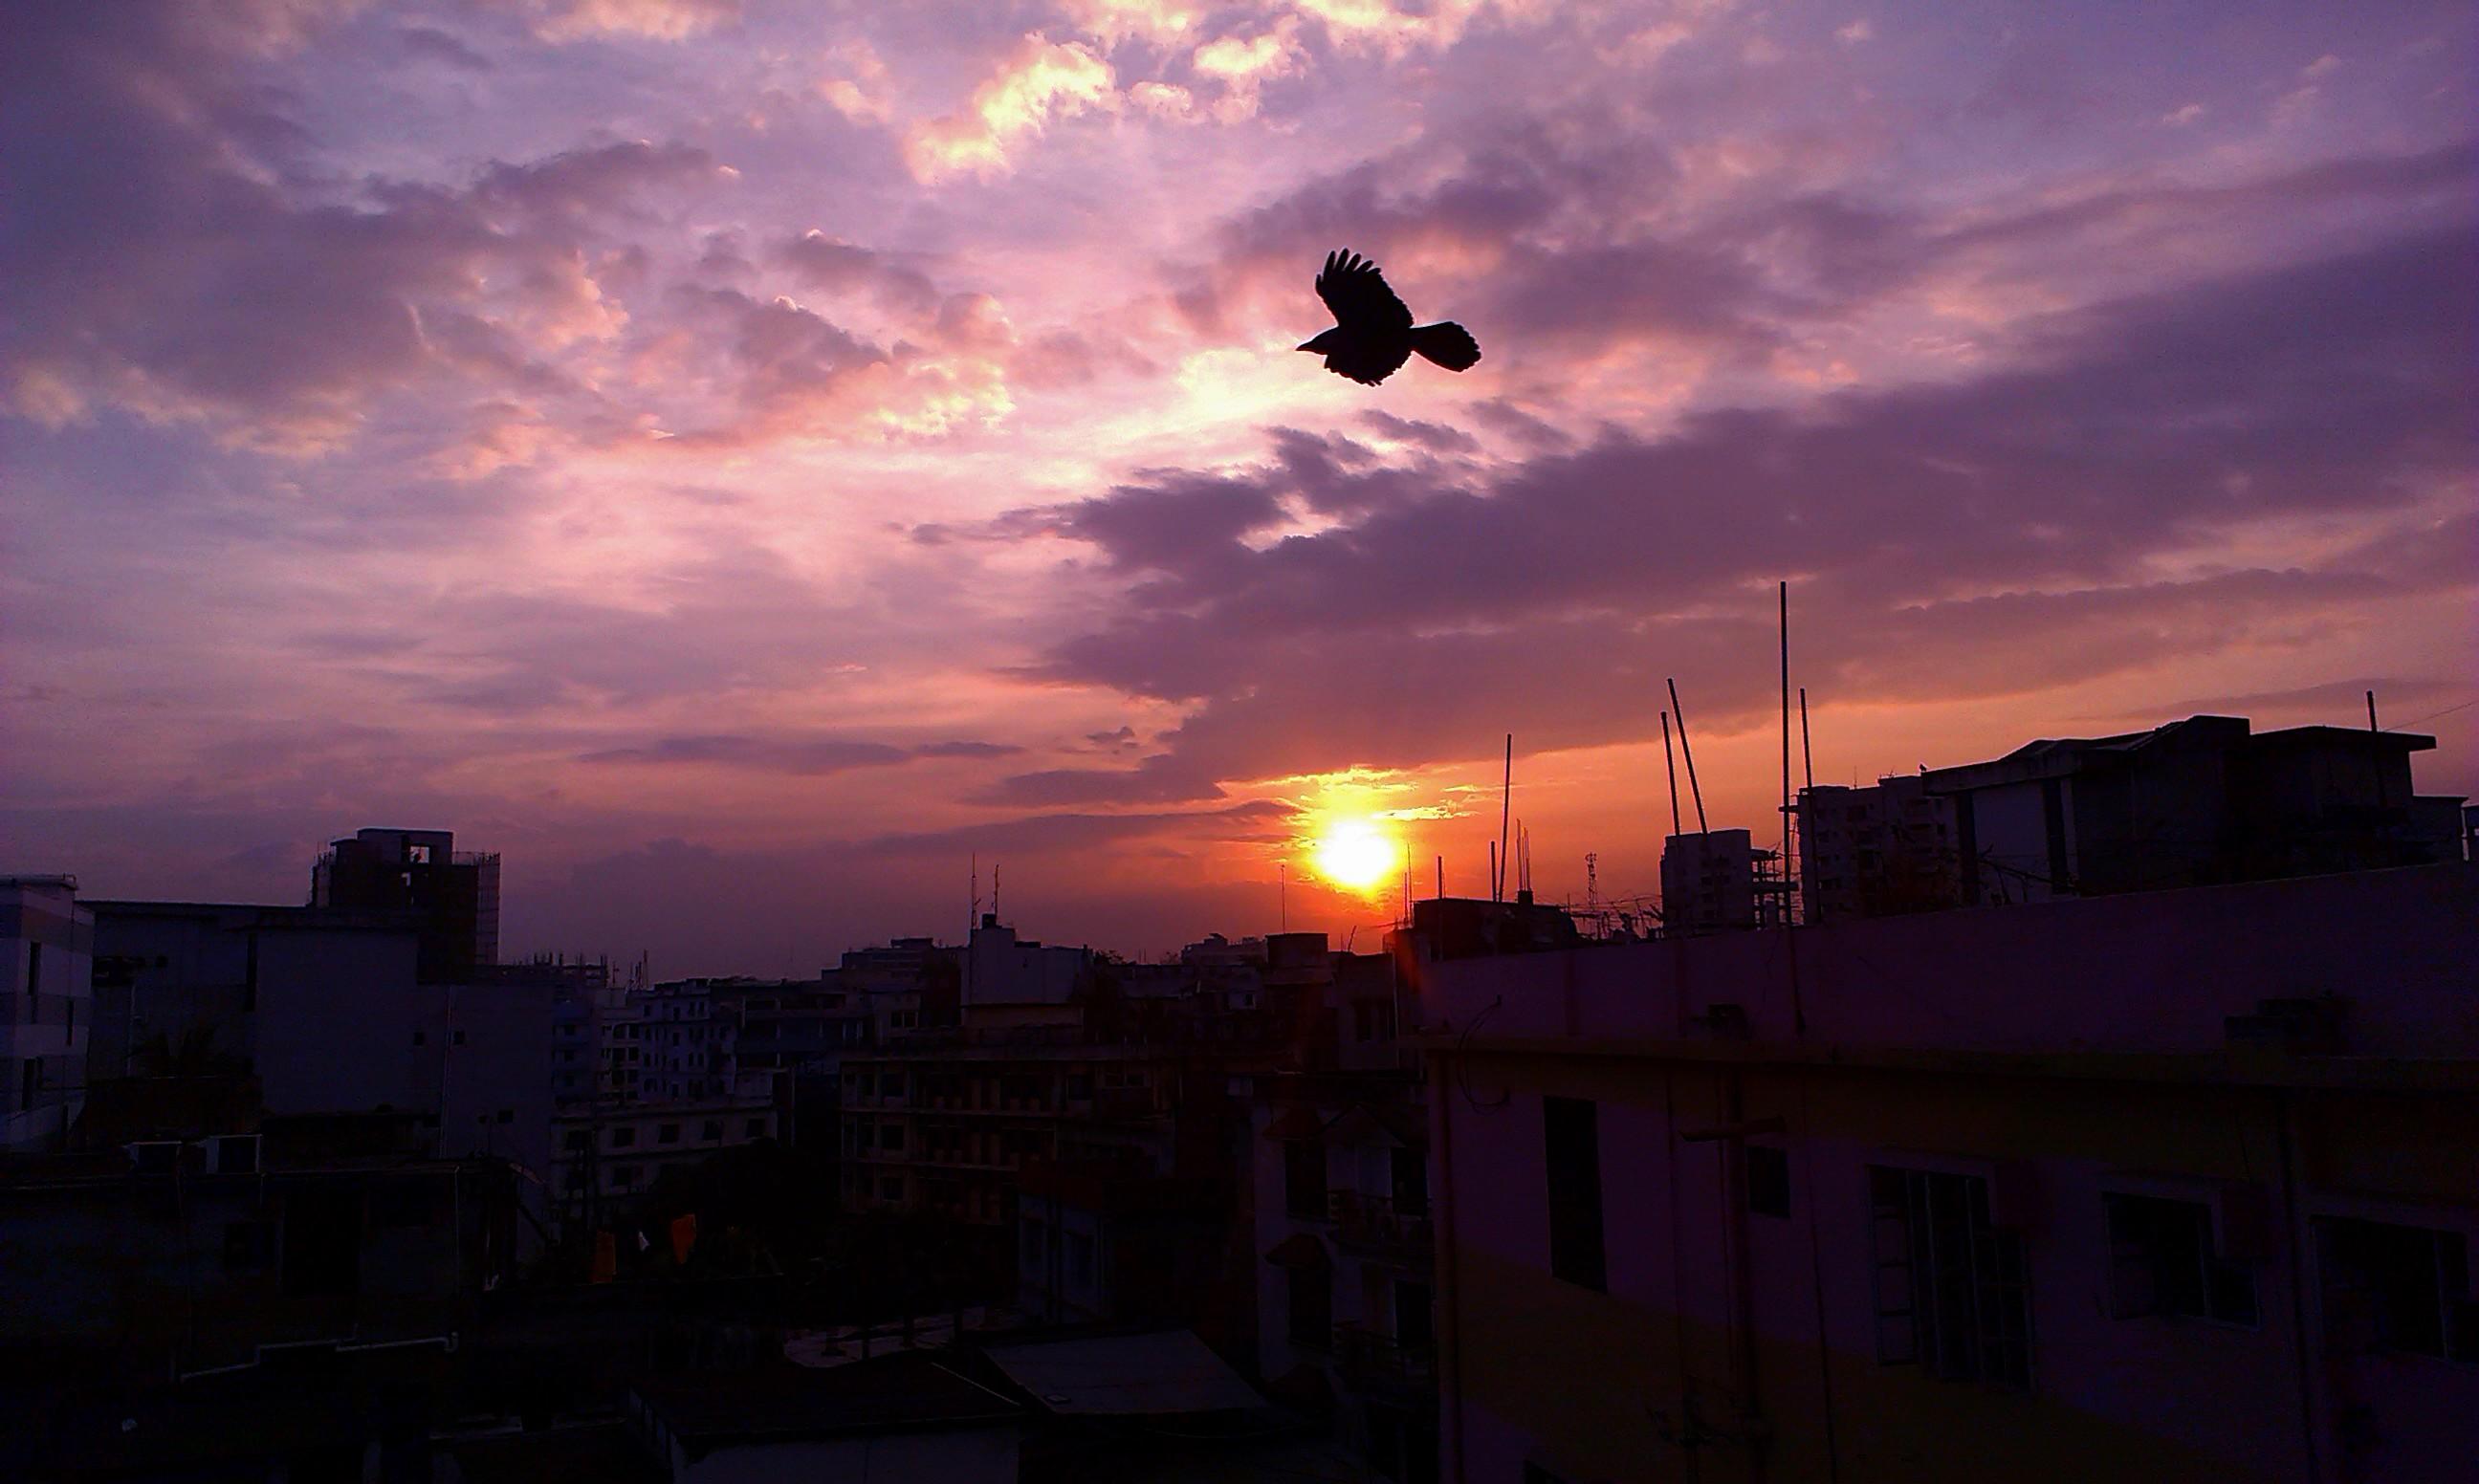 Natural Images Sunrise